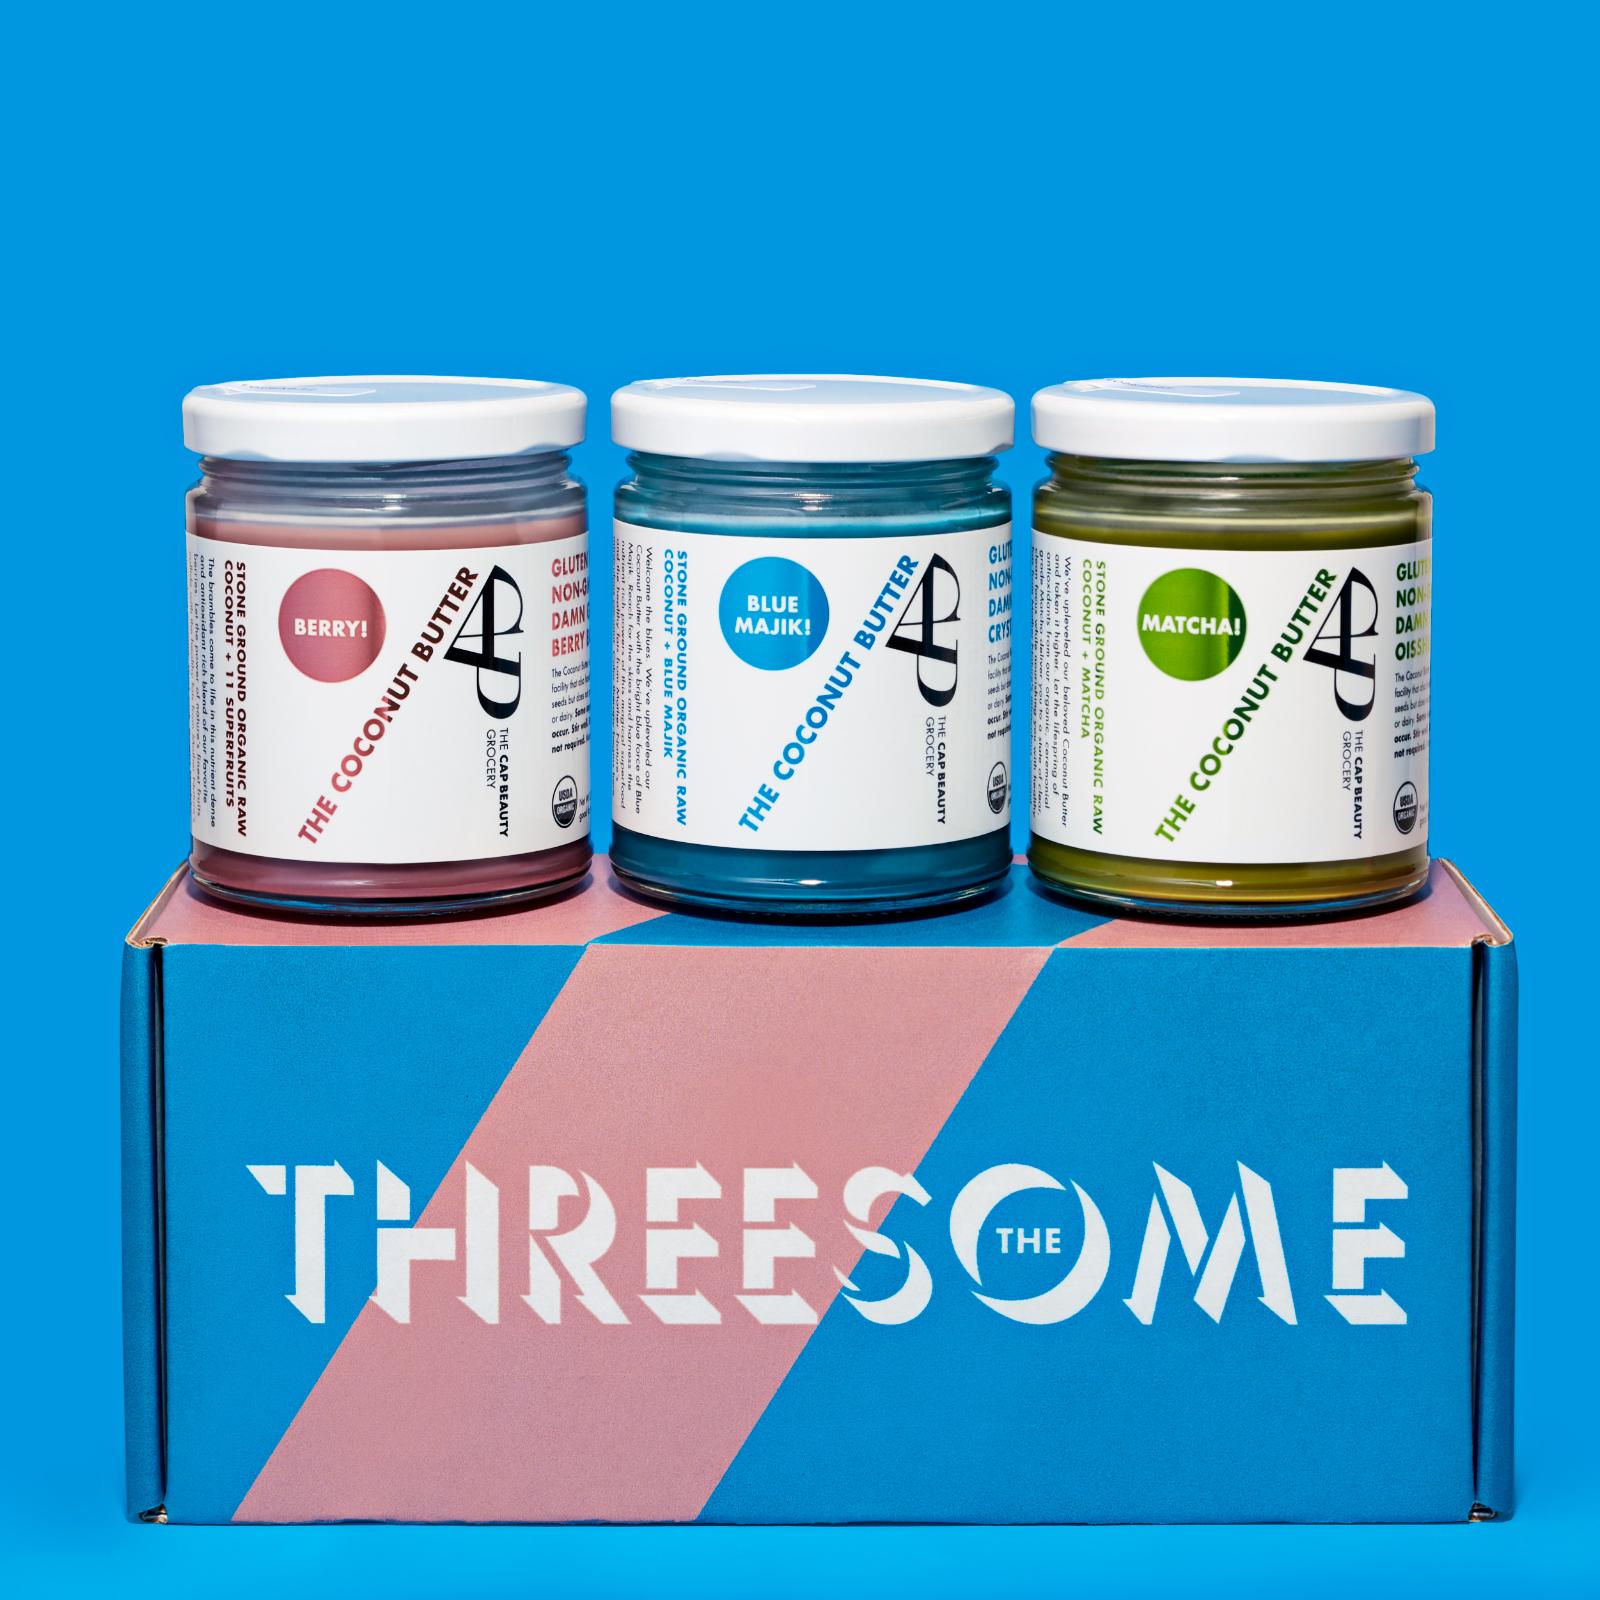 brittany-cutrone-coconut-butter-threesome-2.jpg